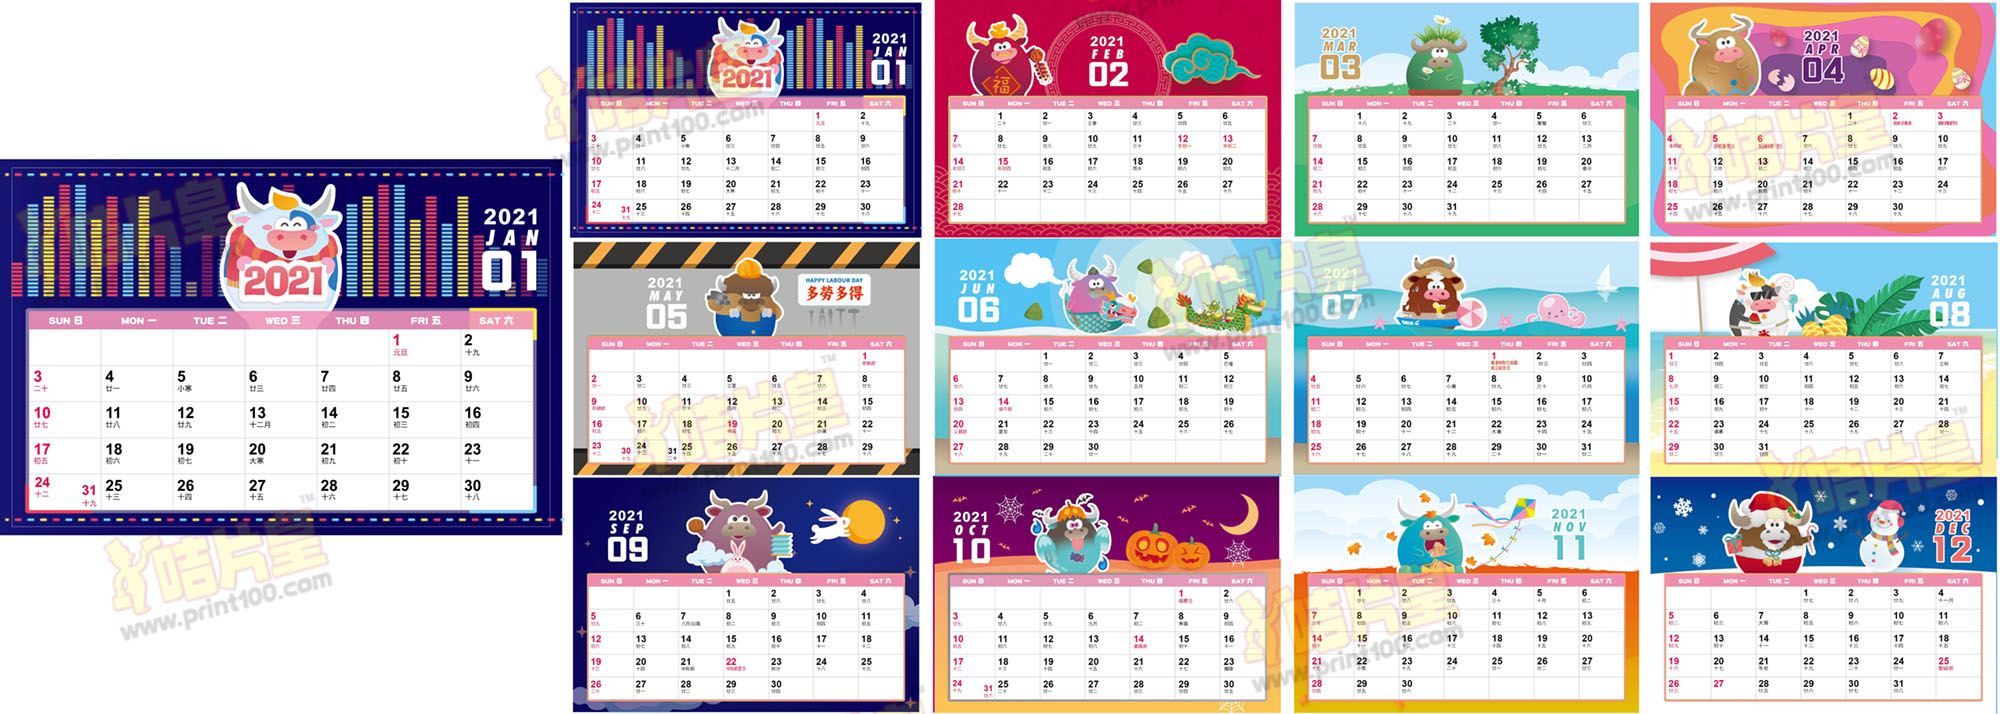 Print100 Standard Content Design for Variant Calendar B